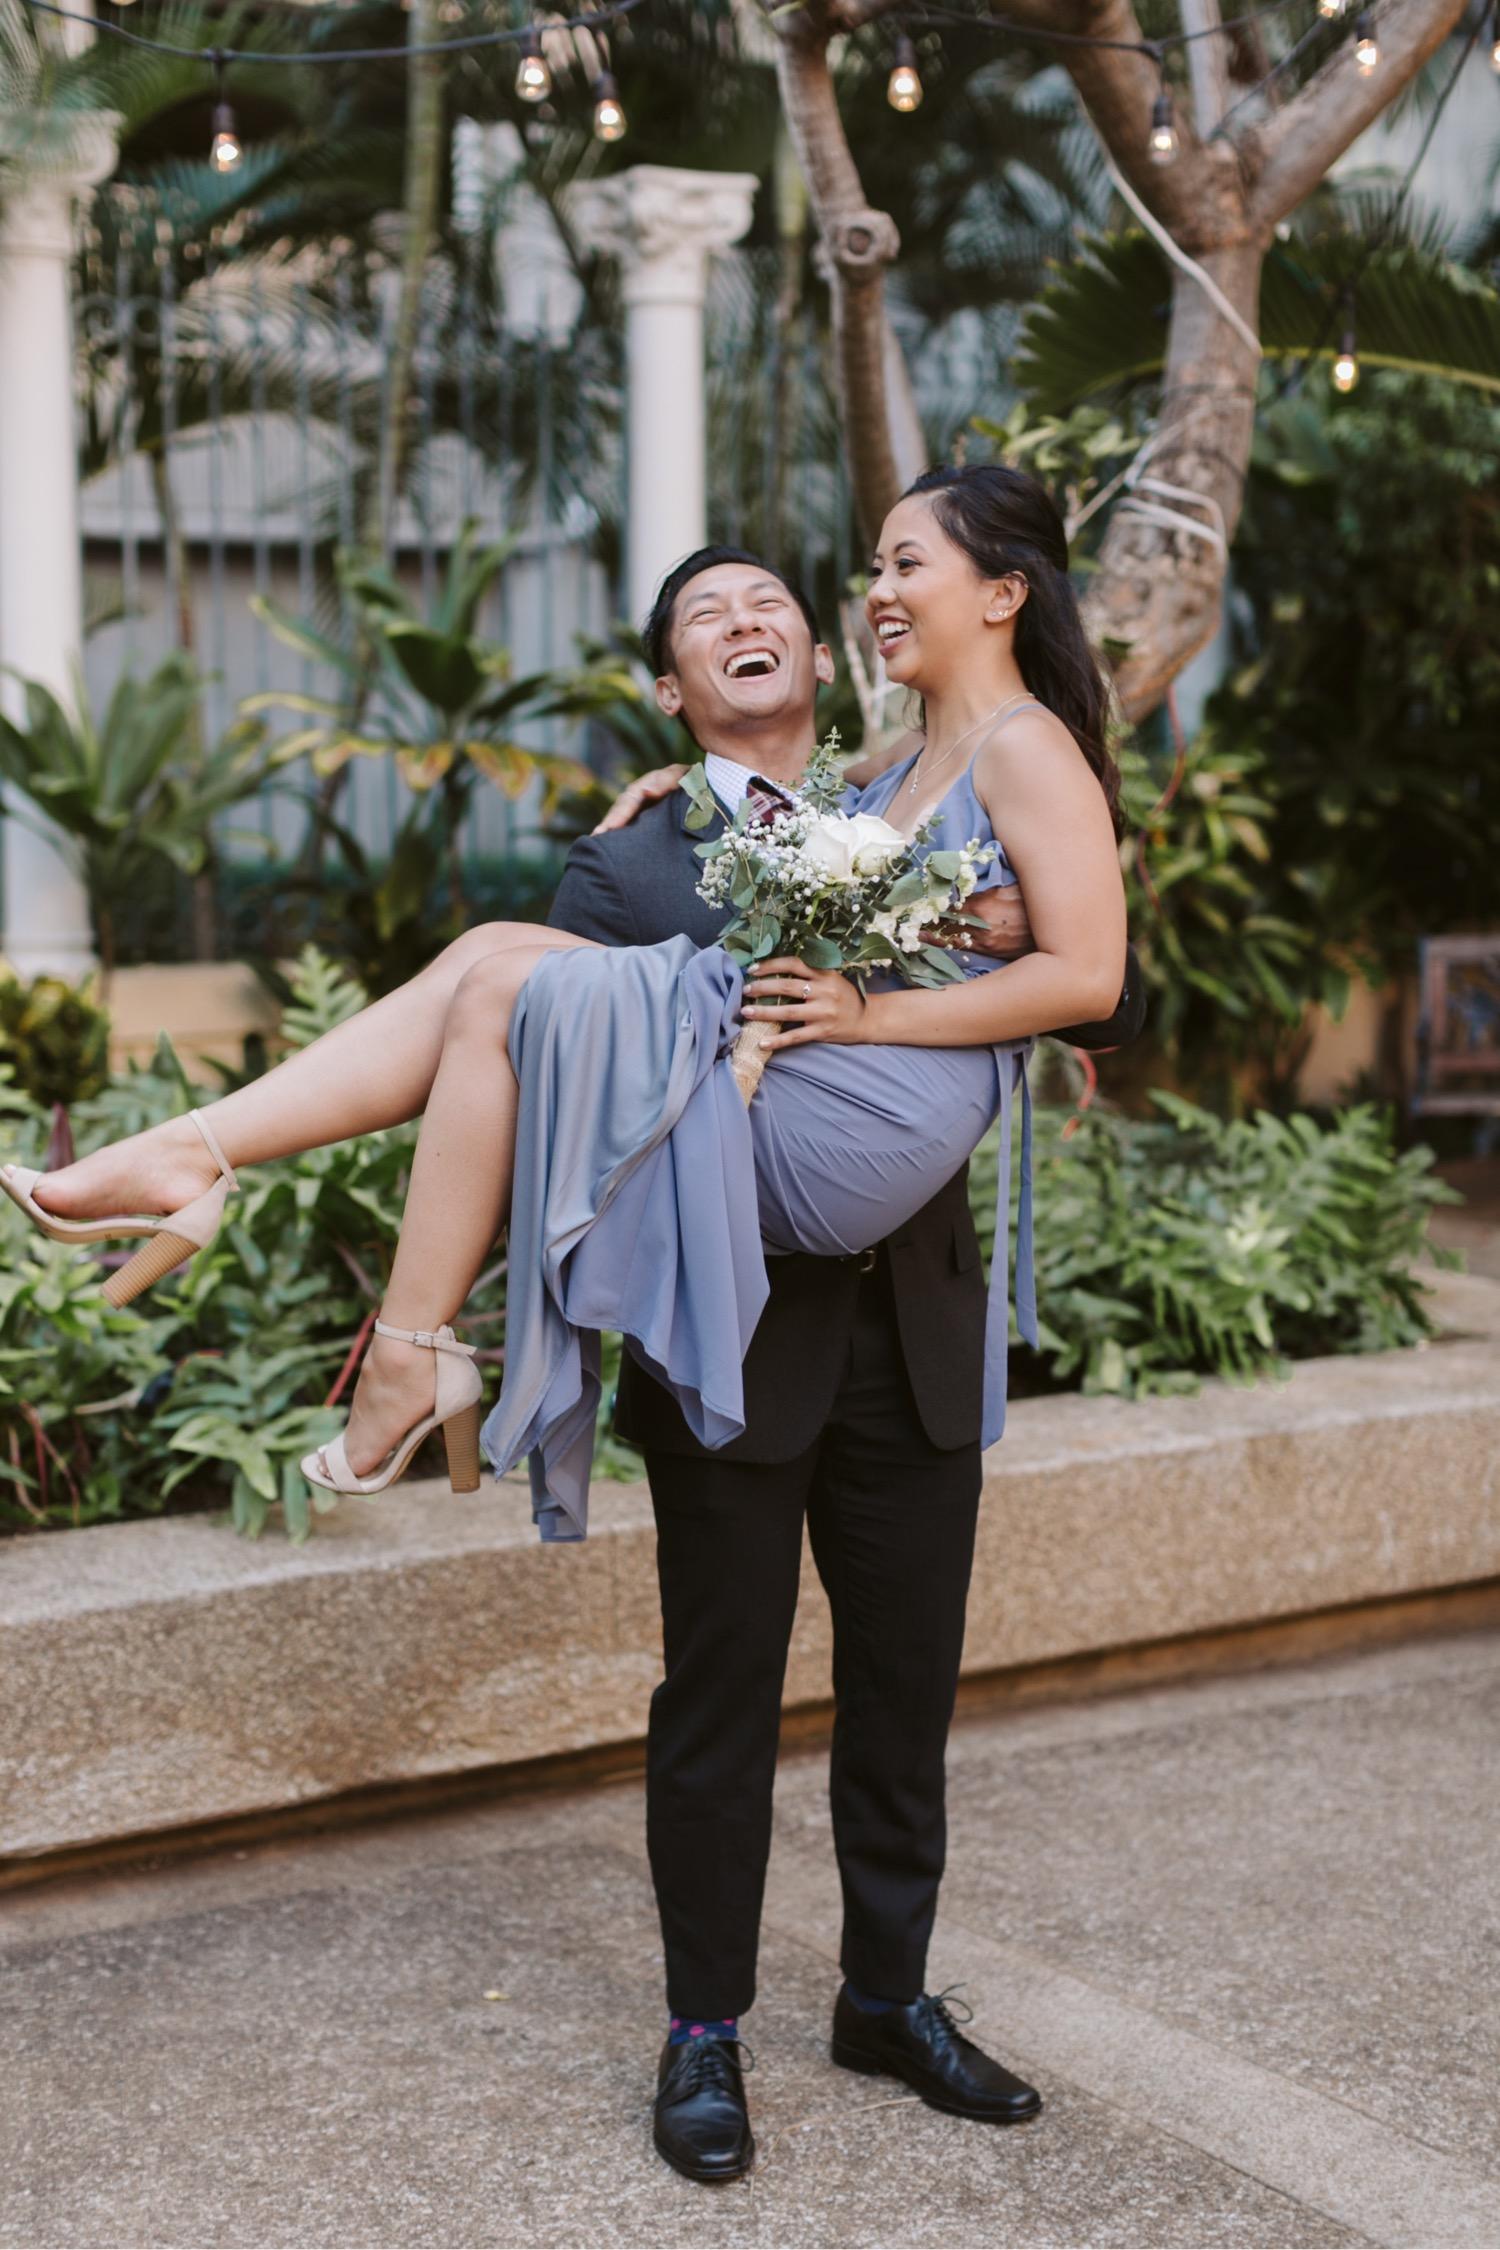 Guests_Julia_Hawaii_Bridesmaids_Honolulu_Wedding_Cafe_reception.jpg